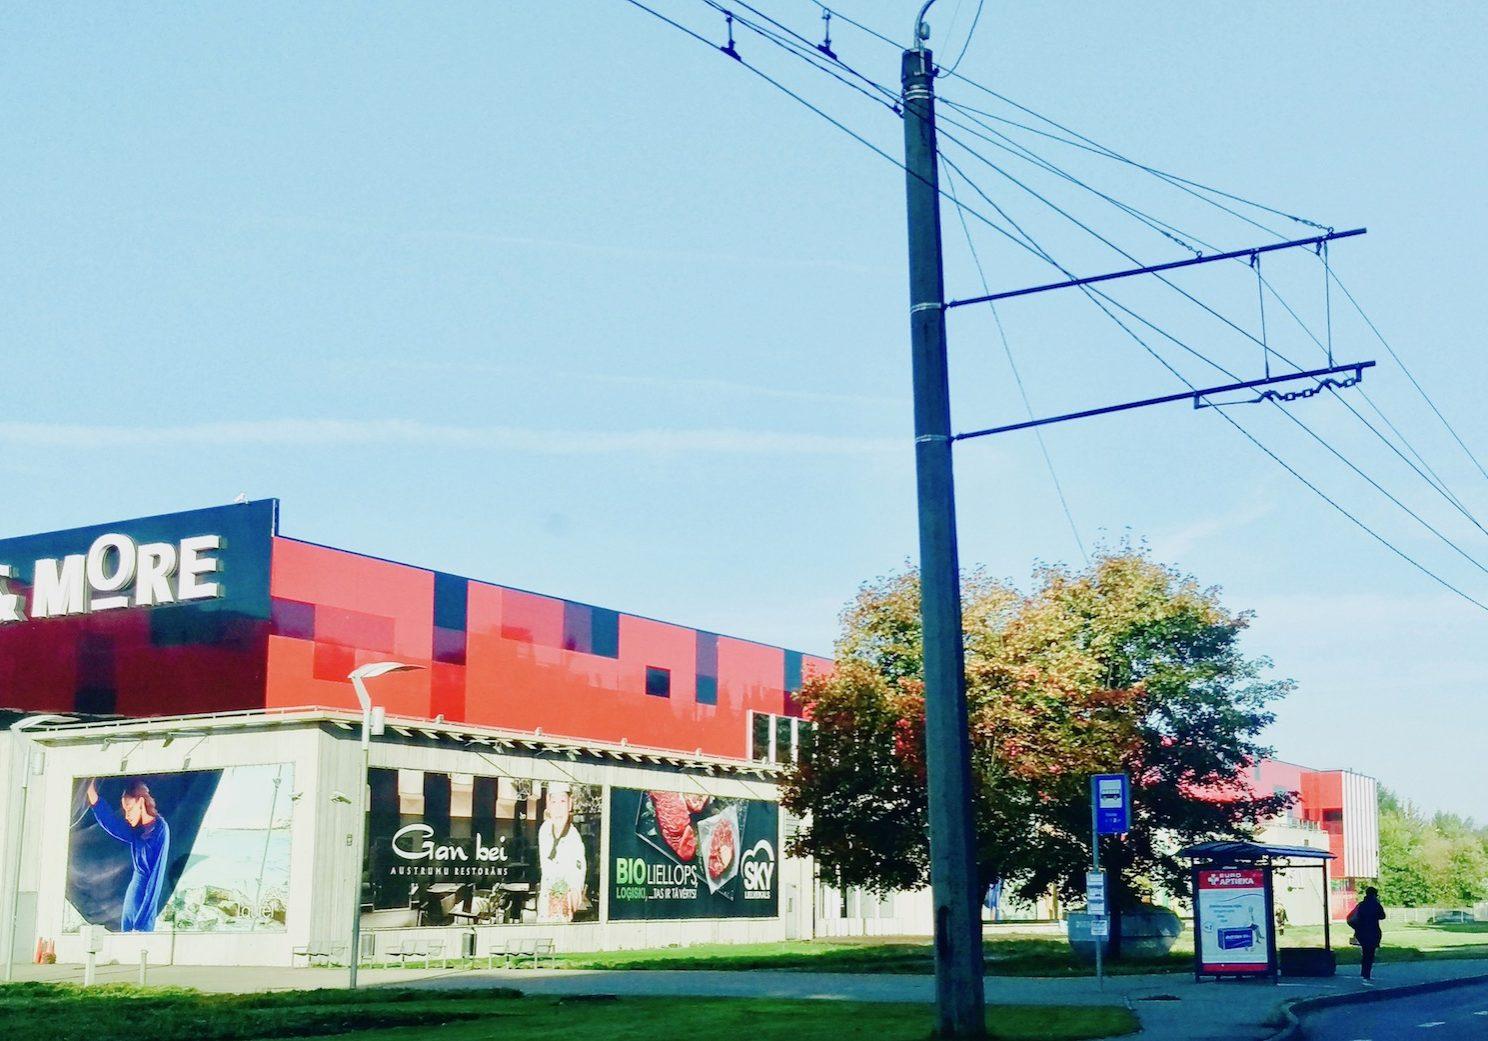 Shopping center: Sky & More